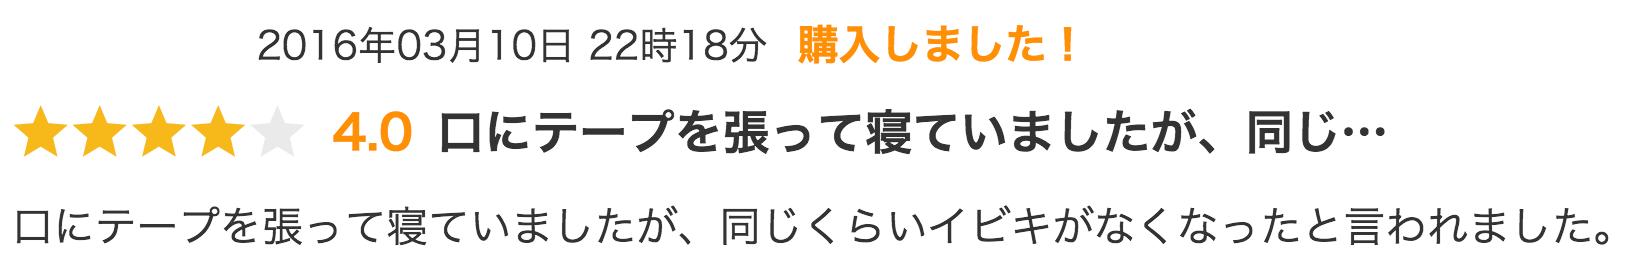 Yahoo!プラス評価のレビュー+3